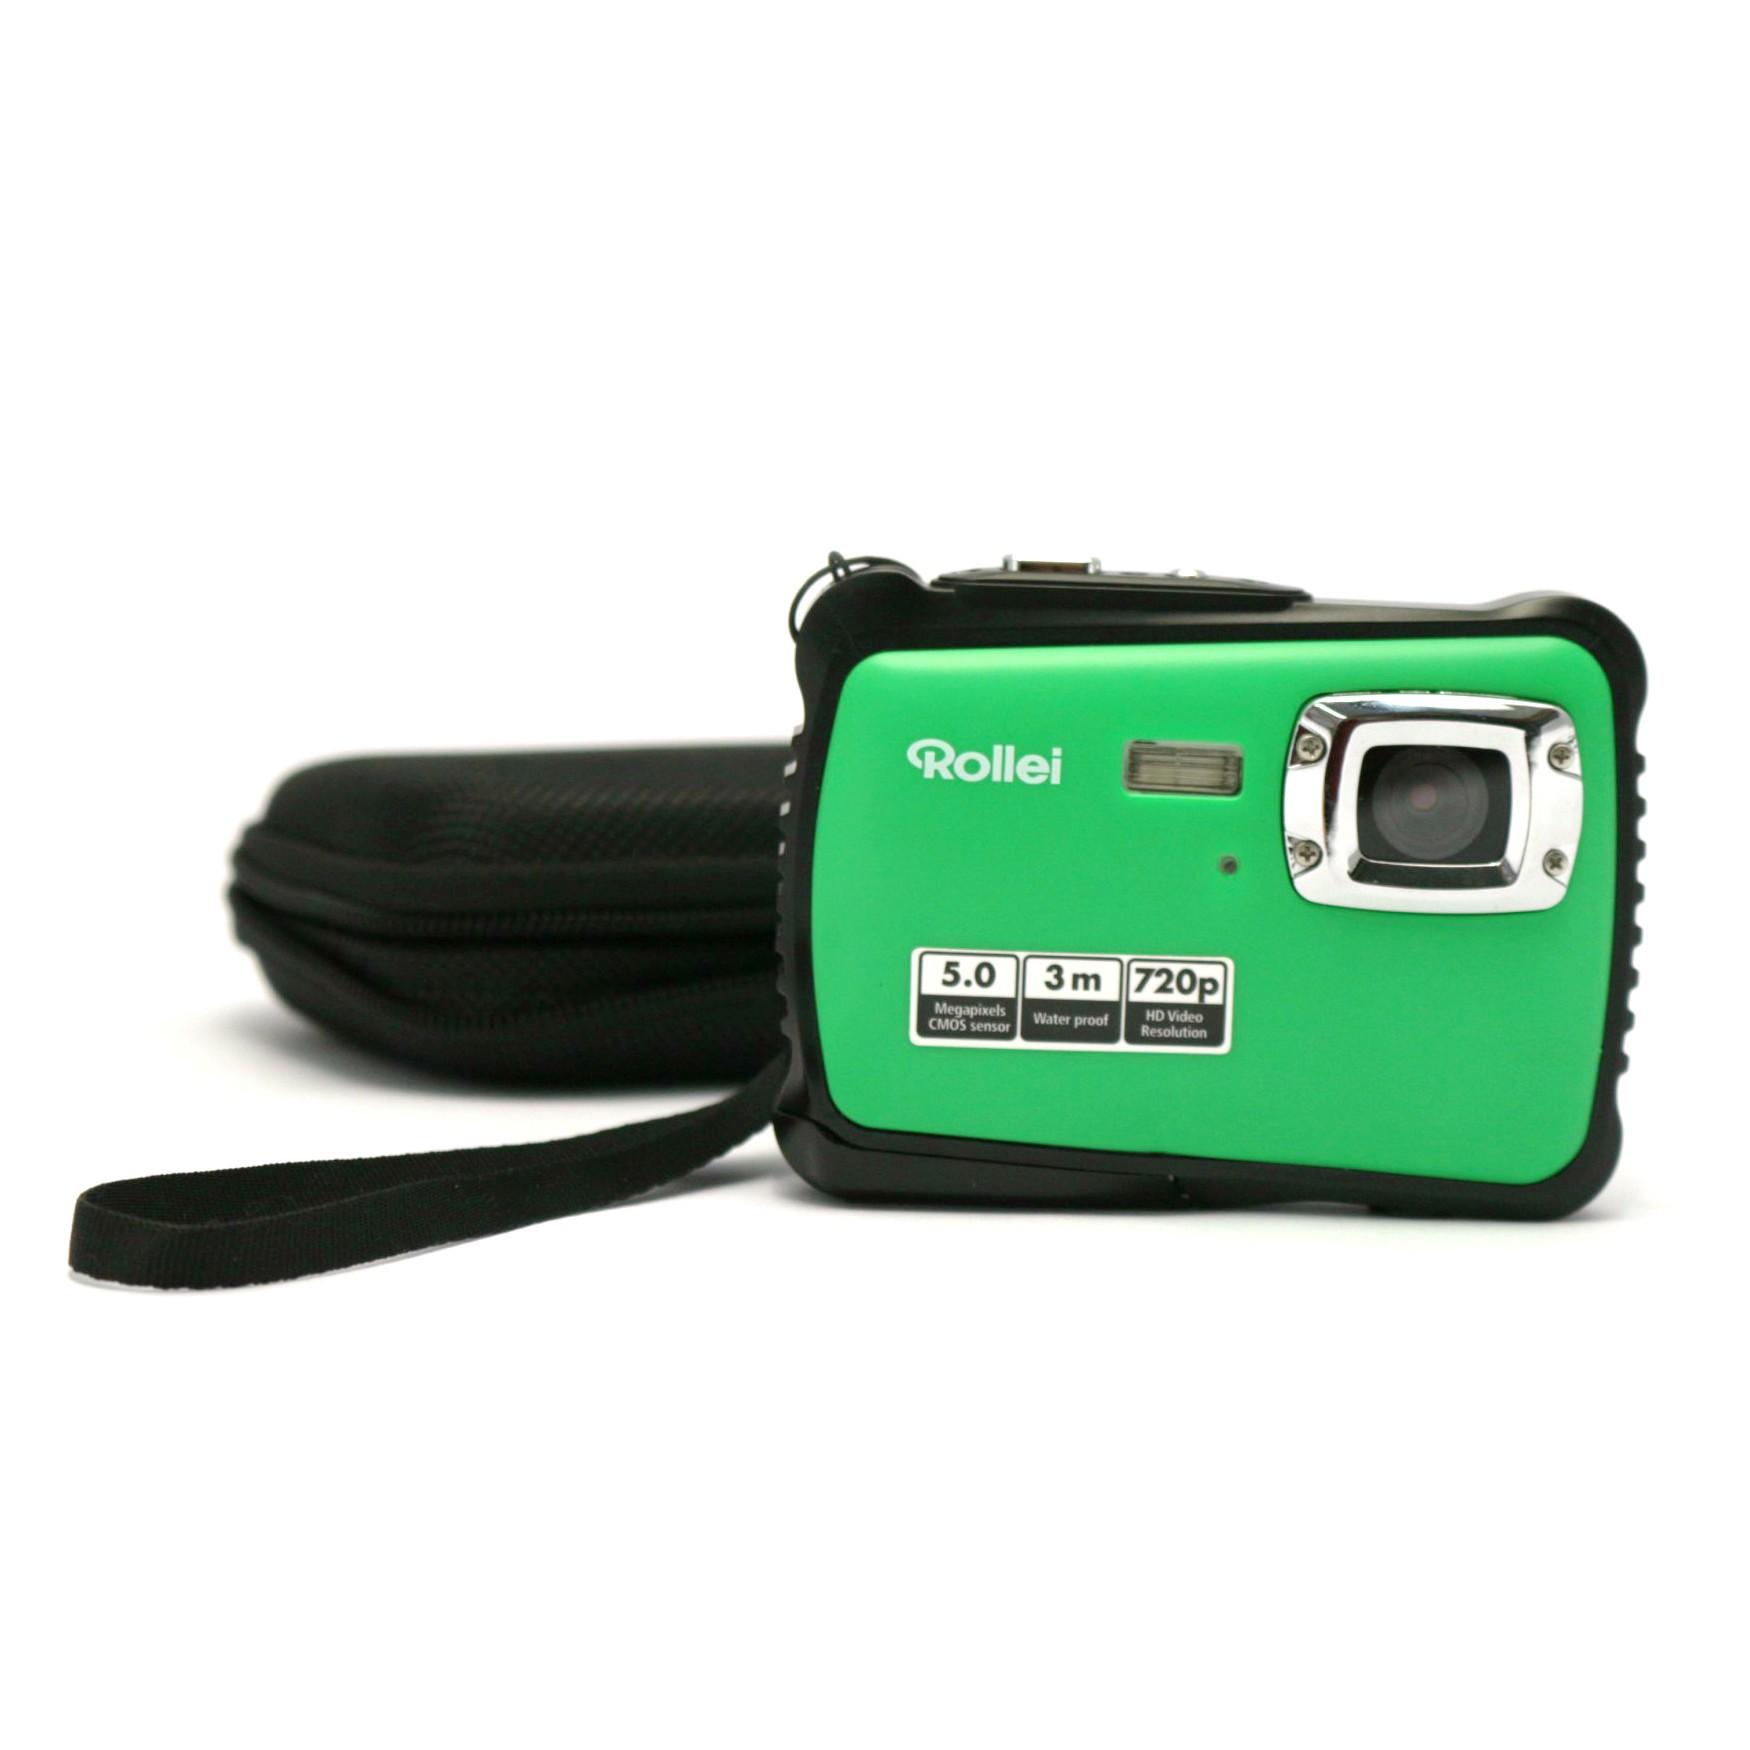 Digital Camera / Kamera: Rollei Sportsline 64 #grün - Batteriefach